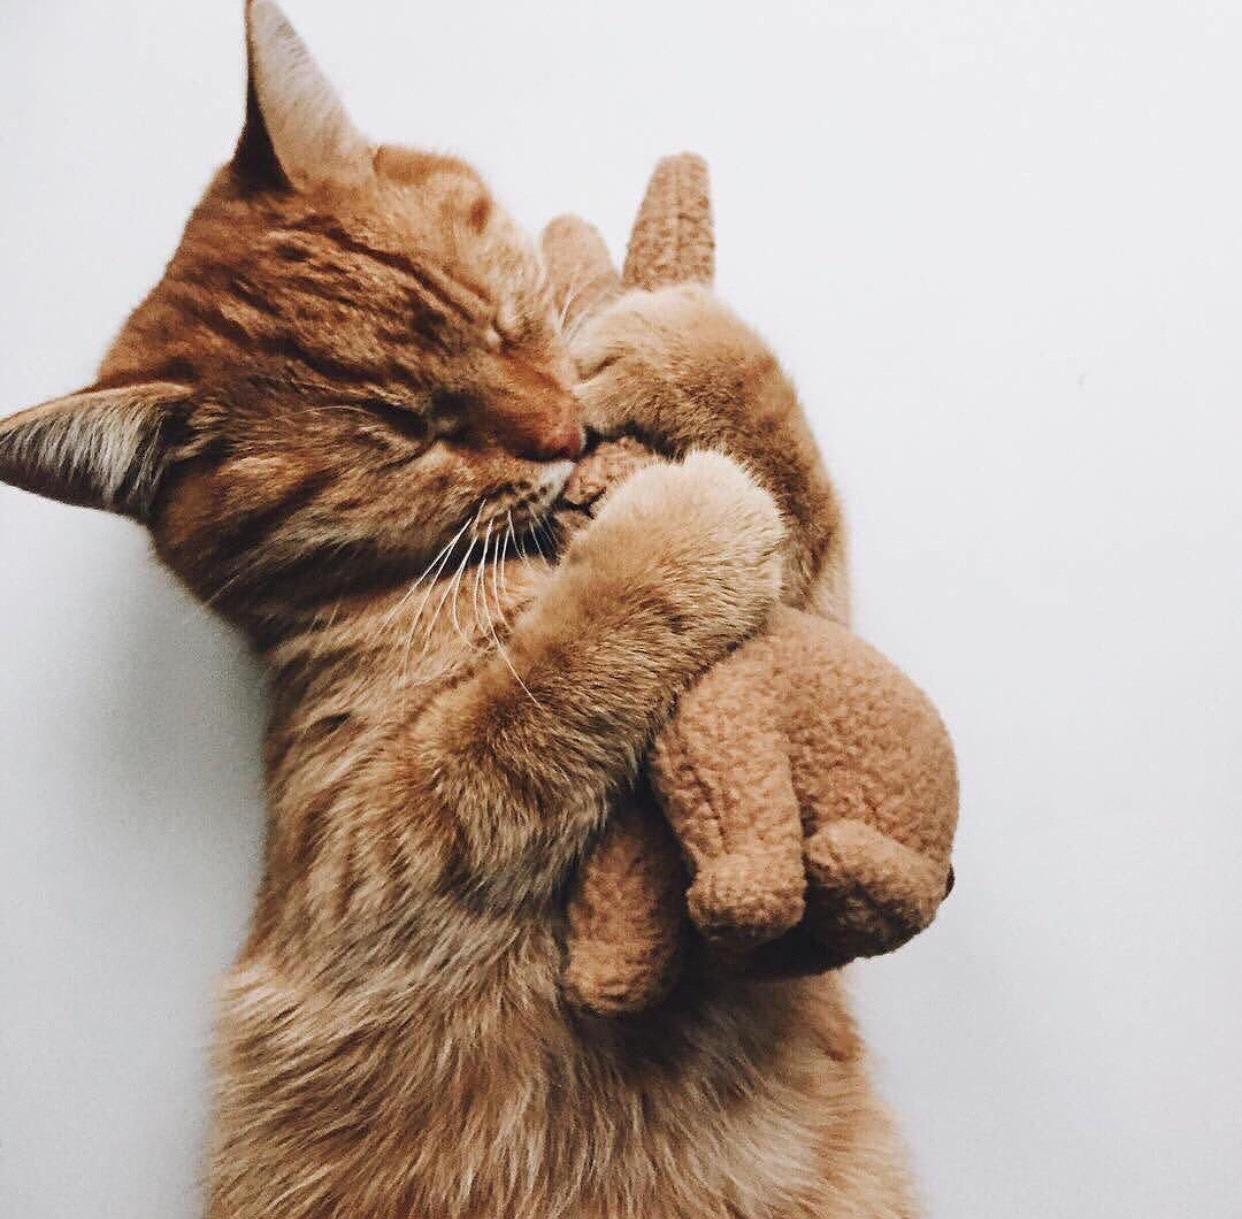 обнял кошку картинки результат дает комбинация